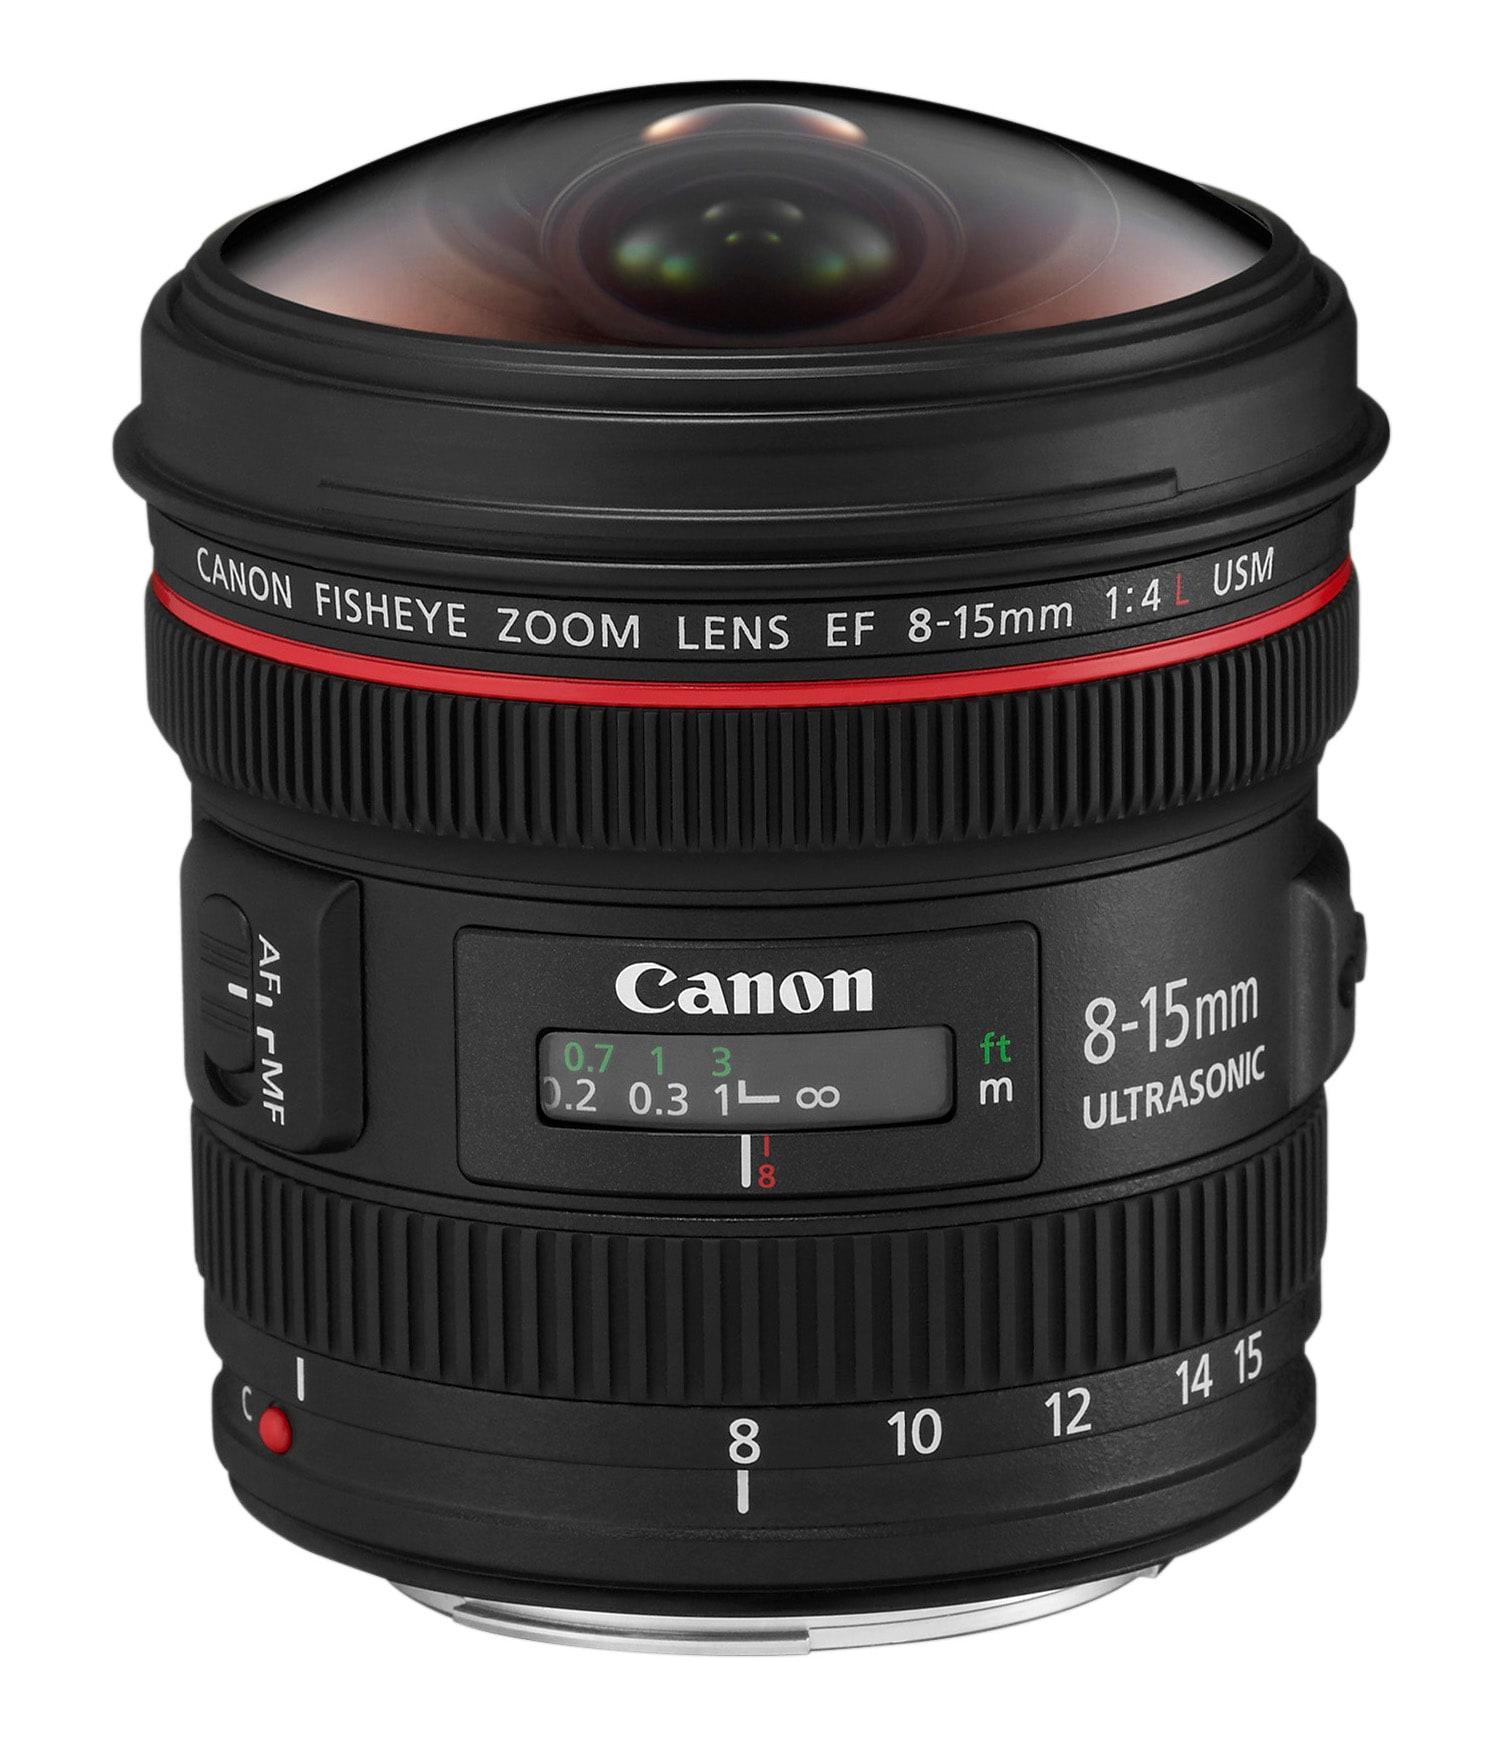 Canon Ef 8-15mm f/4,0L Usm Fisheye